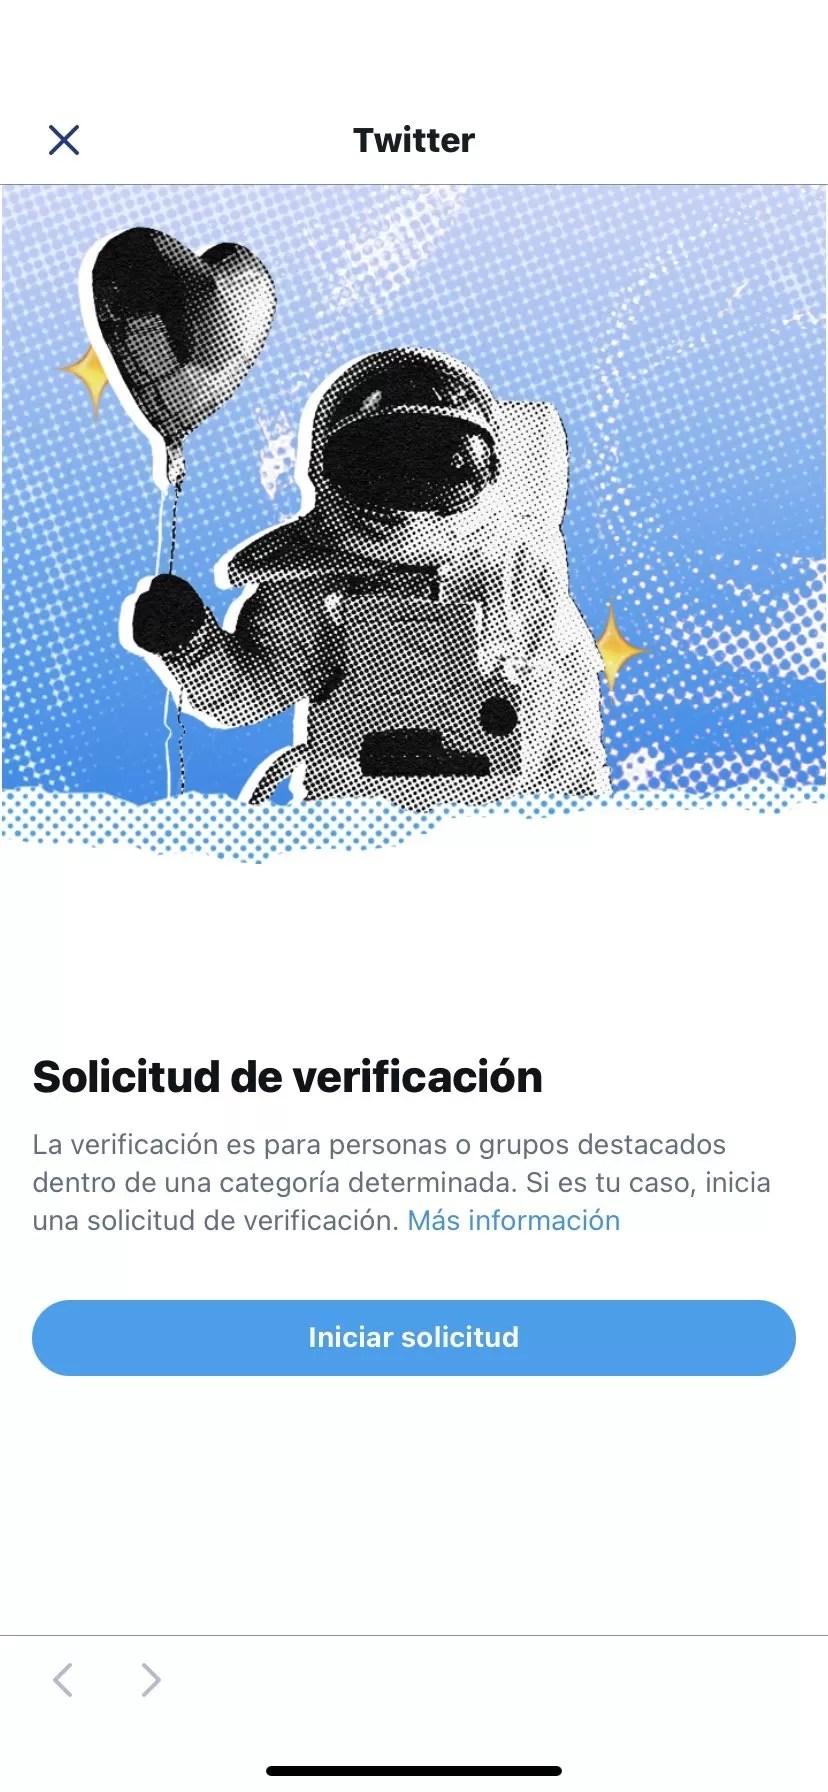 Verificación Twitter MdC99993